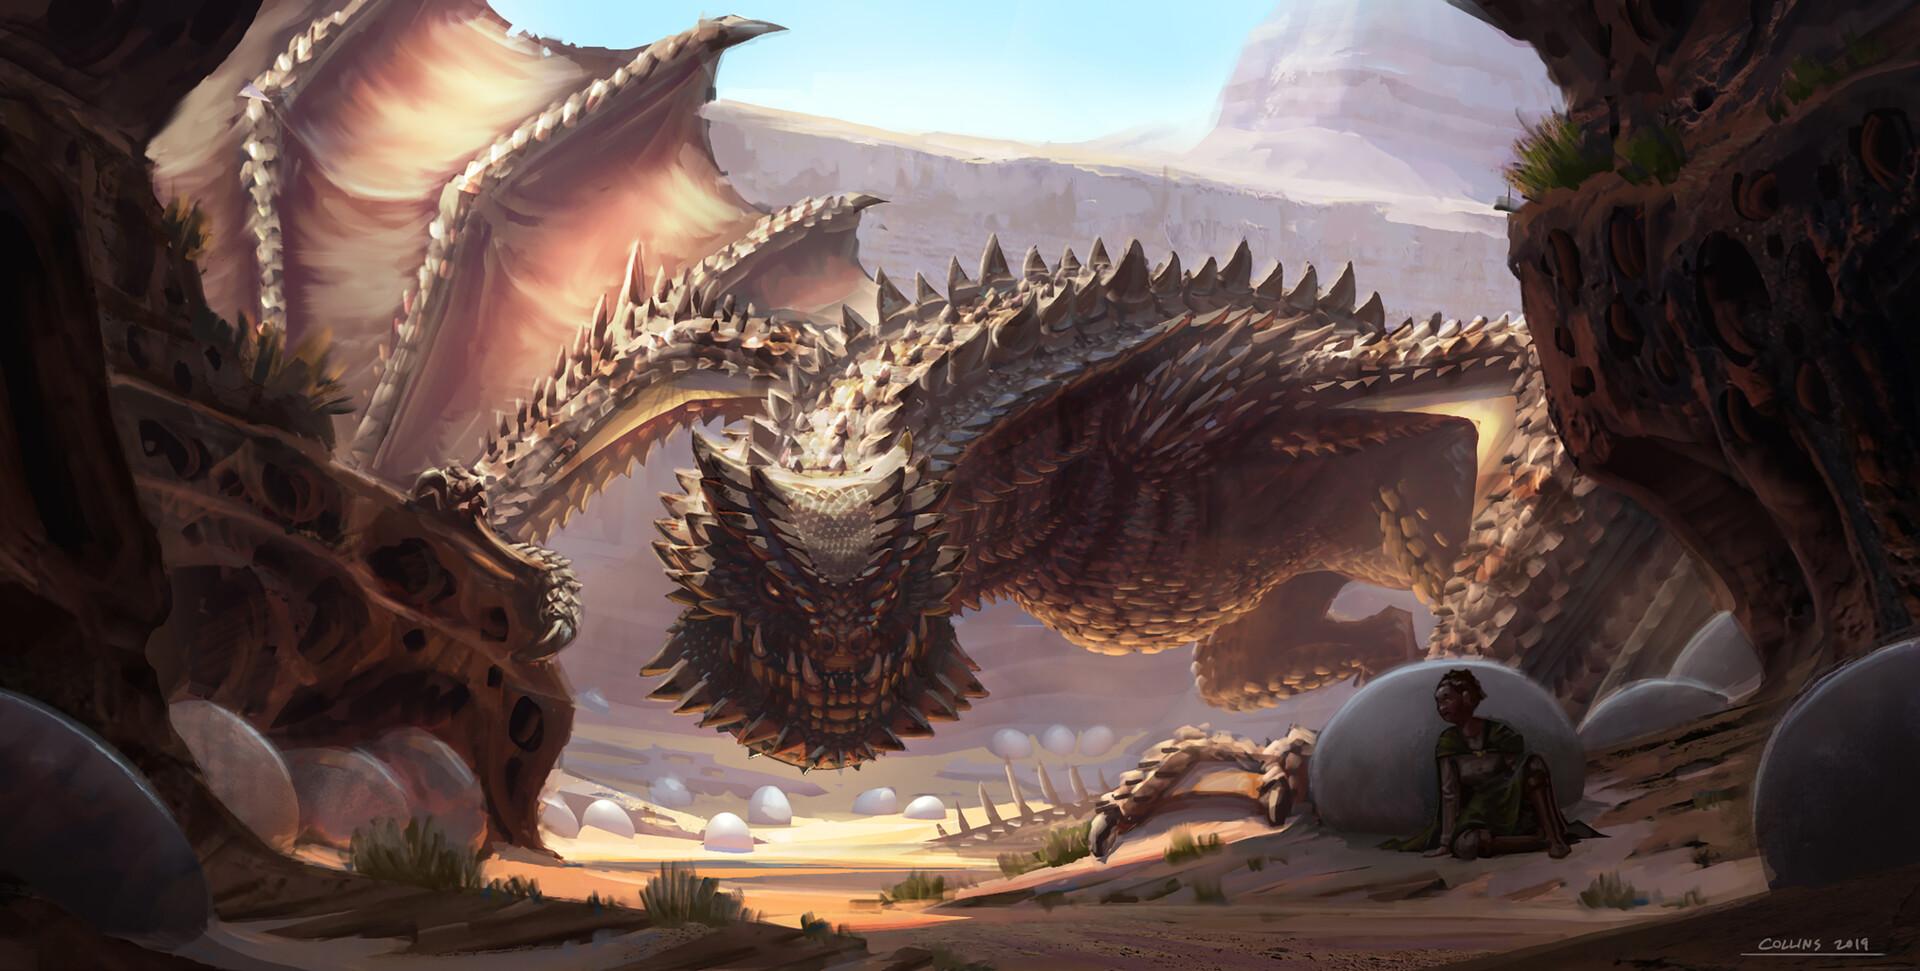 andrew-collins-desert-biome-dragon-final.jpg